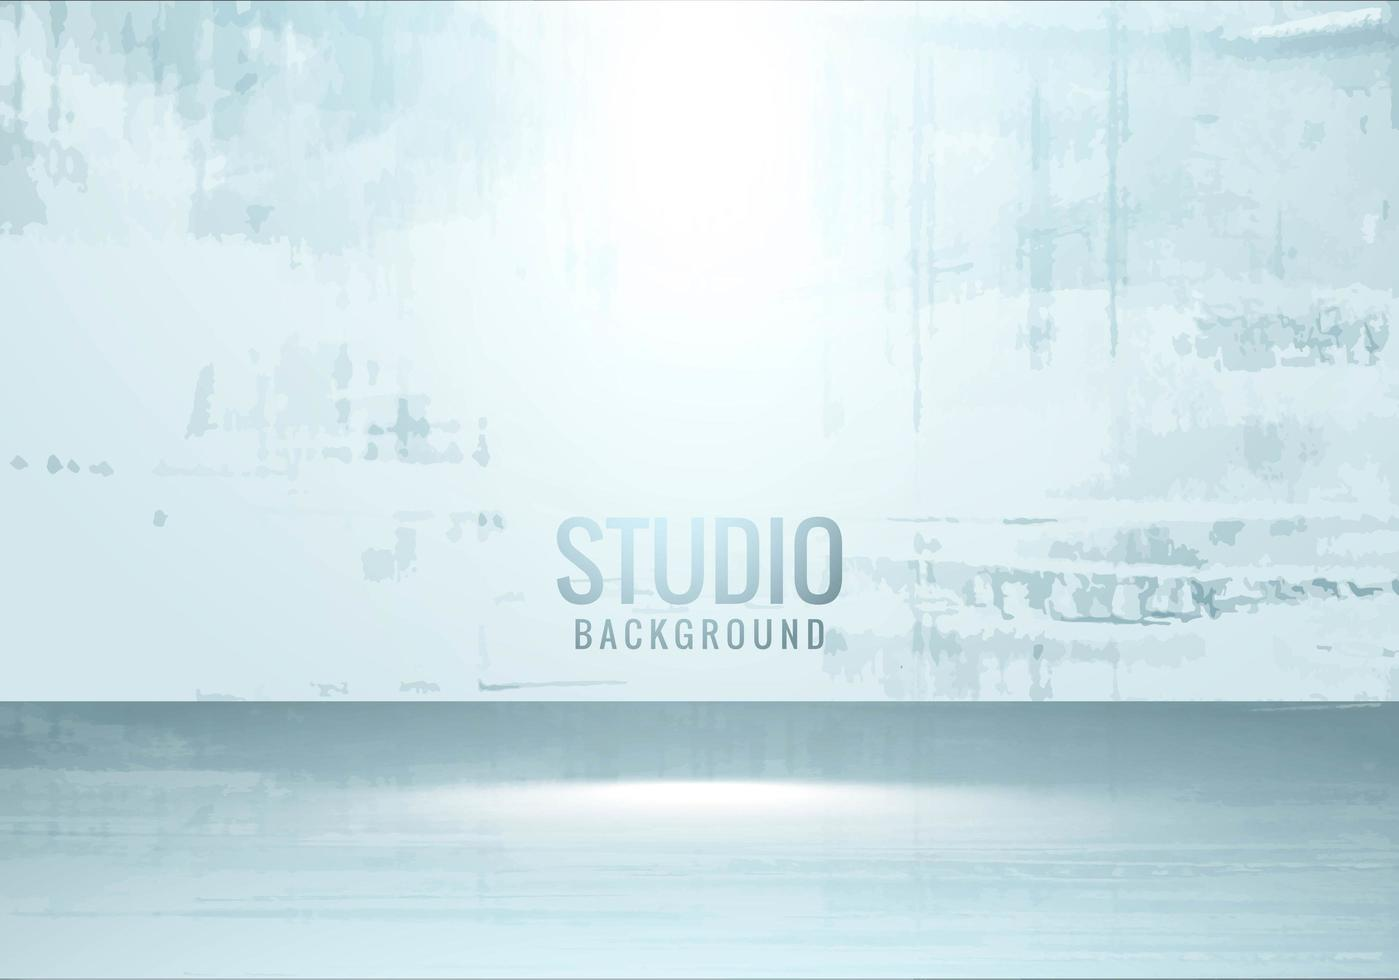 Grunge Wall Studio with Spotlight Background vector